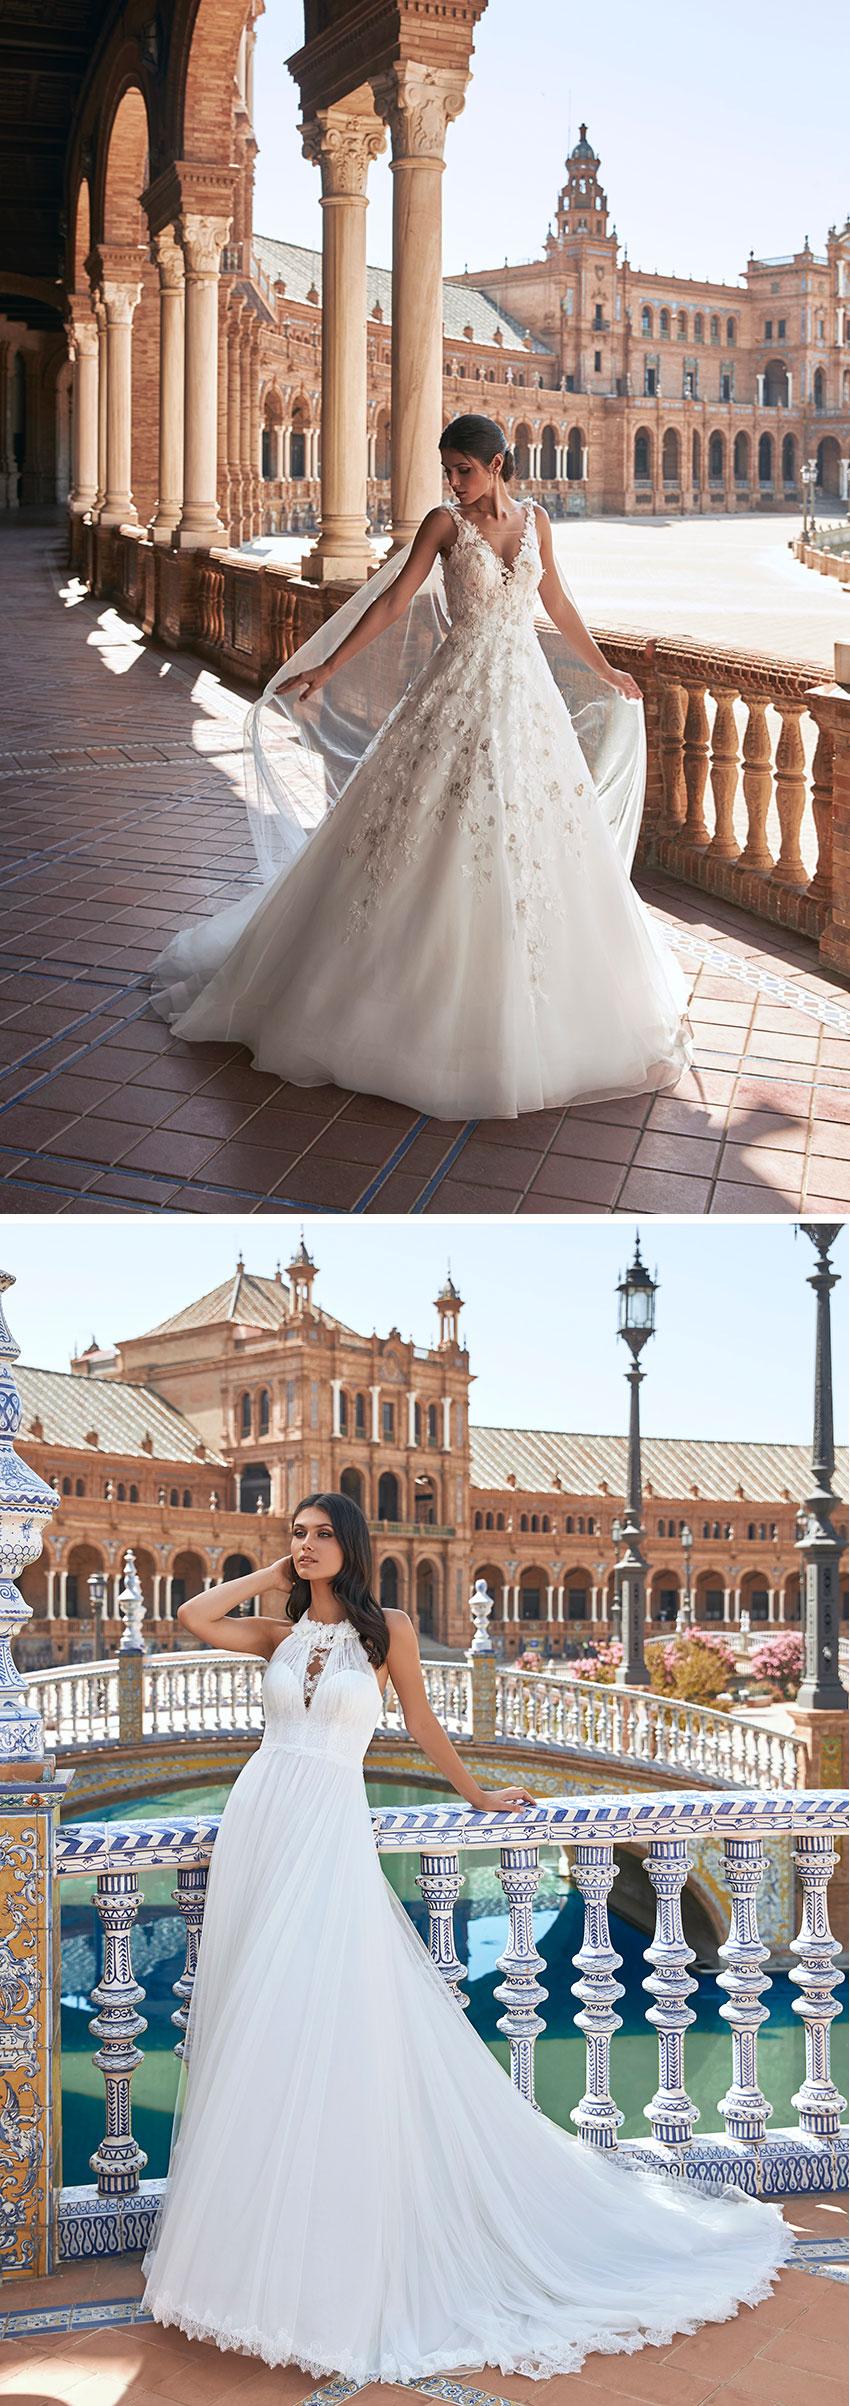 Marchesa for Pronovias bridal collection Perfect Wedding Magazine